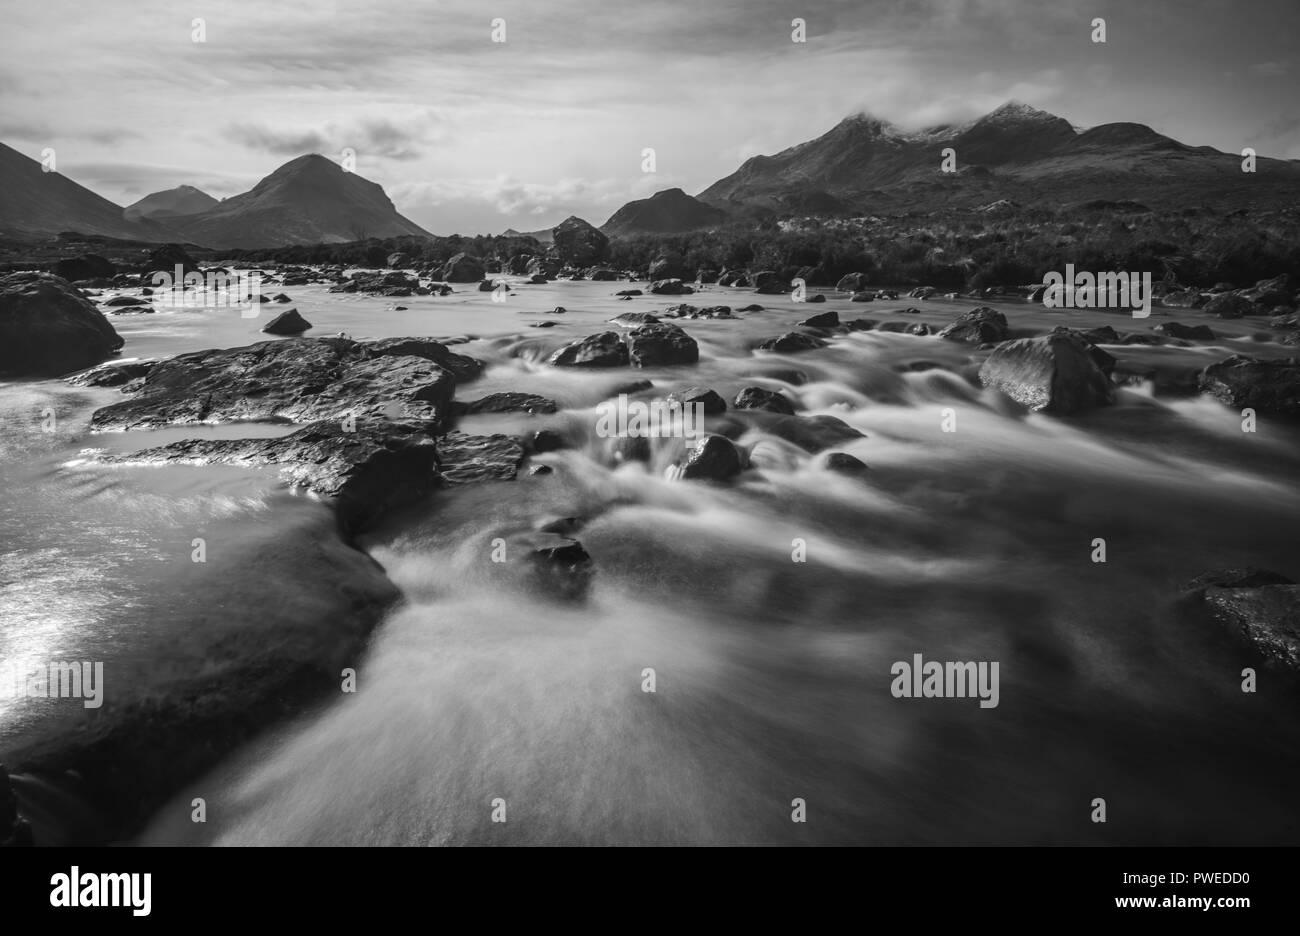 Black and White, Long exposure of the Cascades, Sliglachan, Black Cuillin Mountain Range, Scotland, Uk - Stock Image